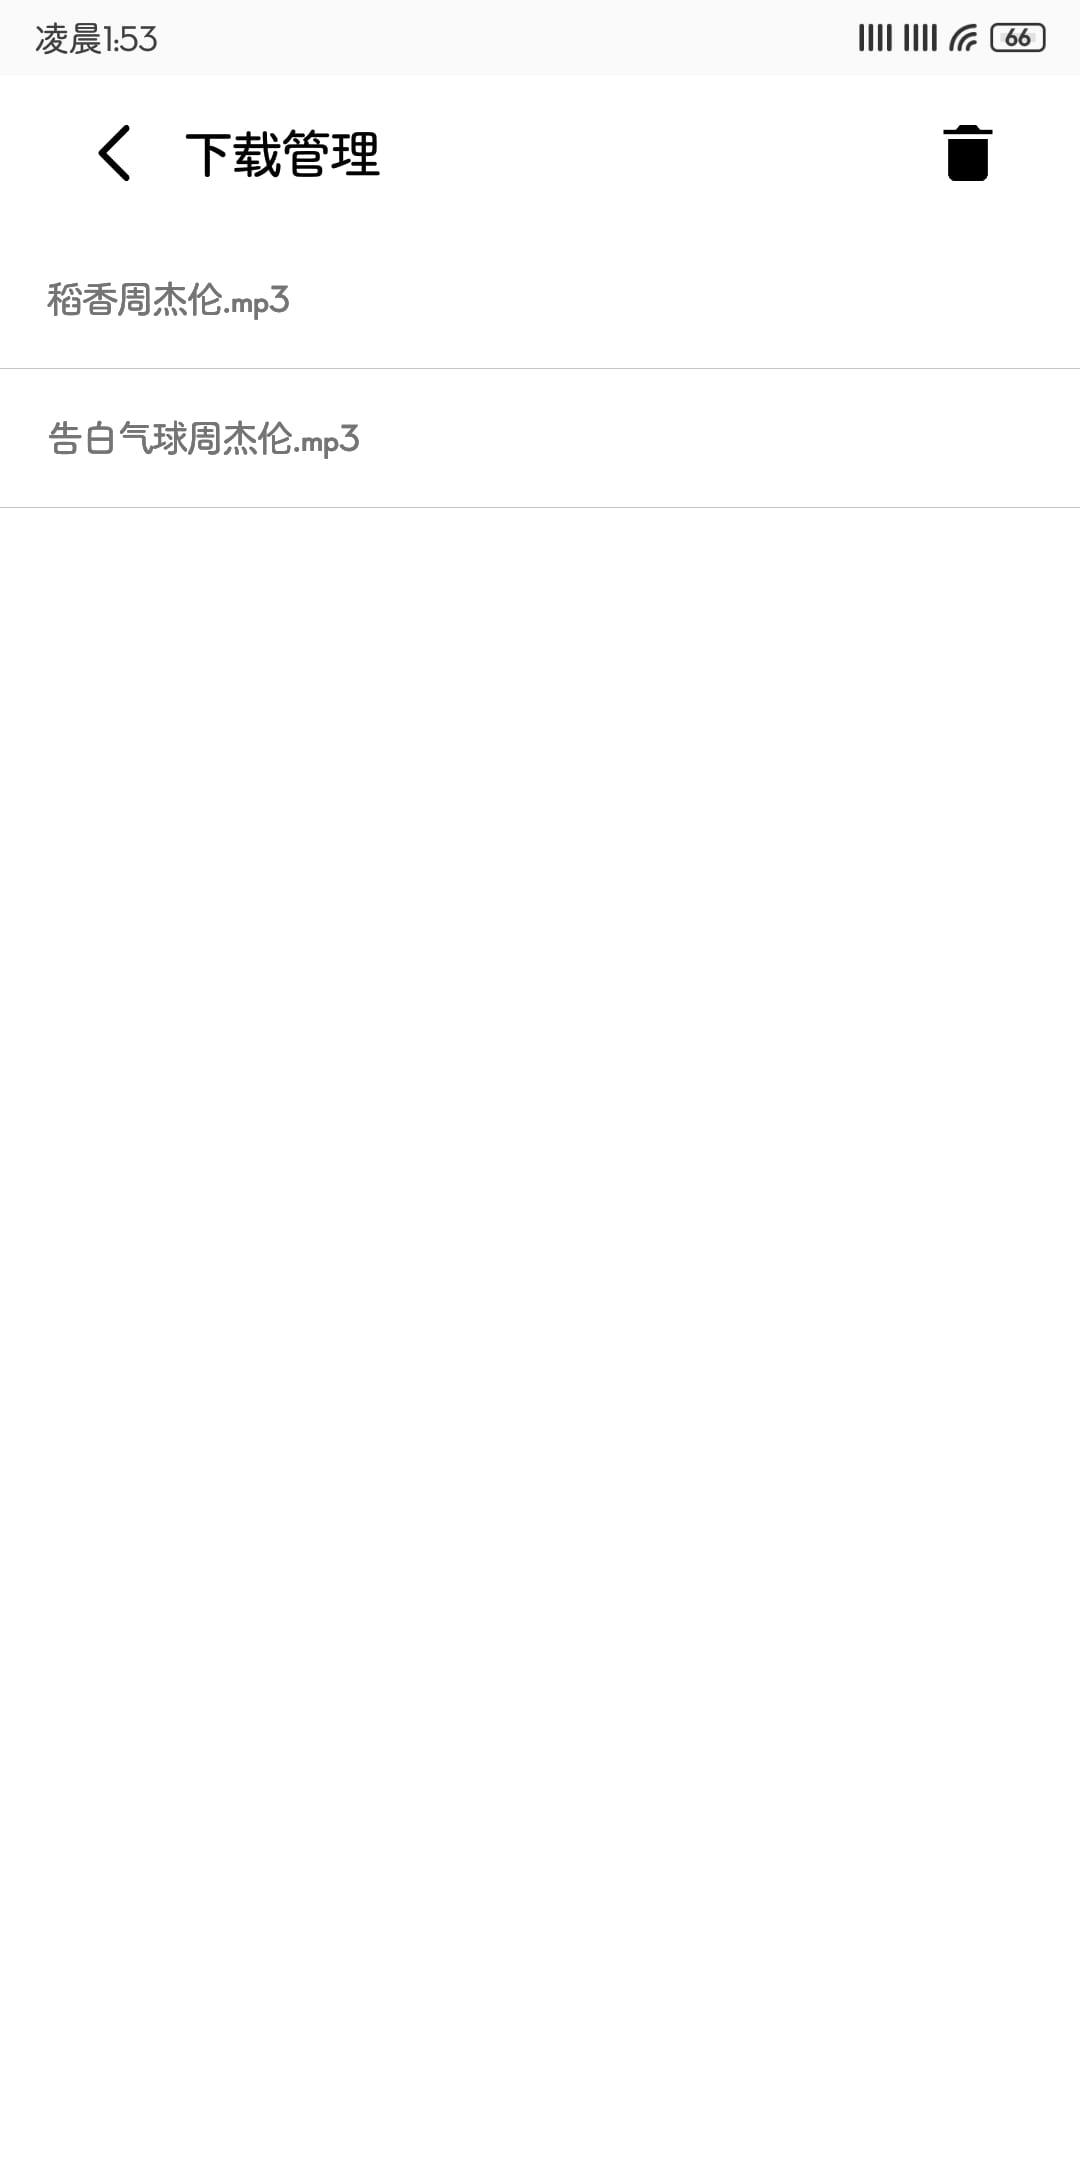 OfficeSuite Pro专业版破解版截图0